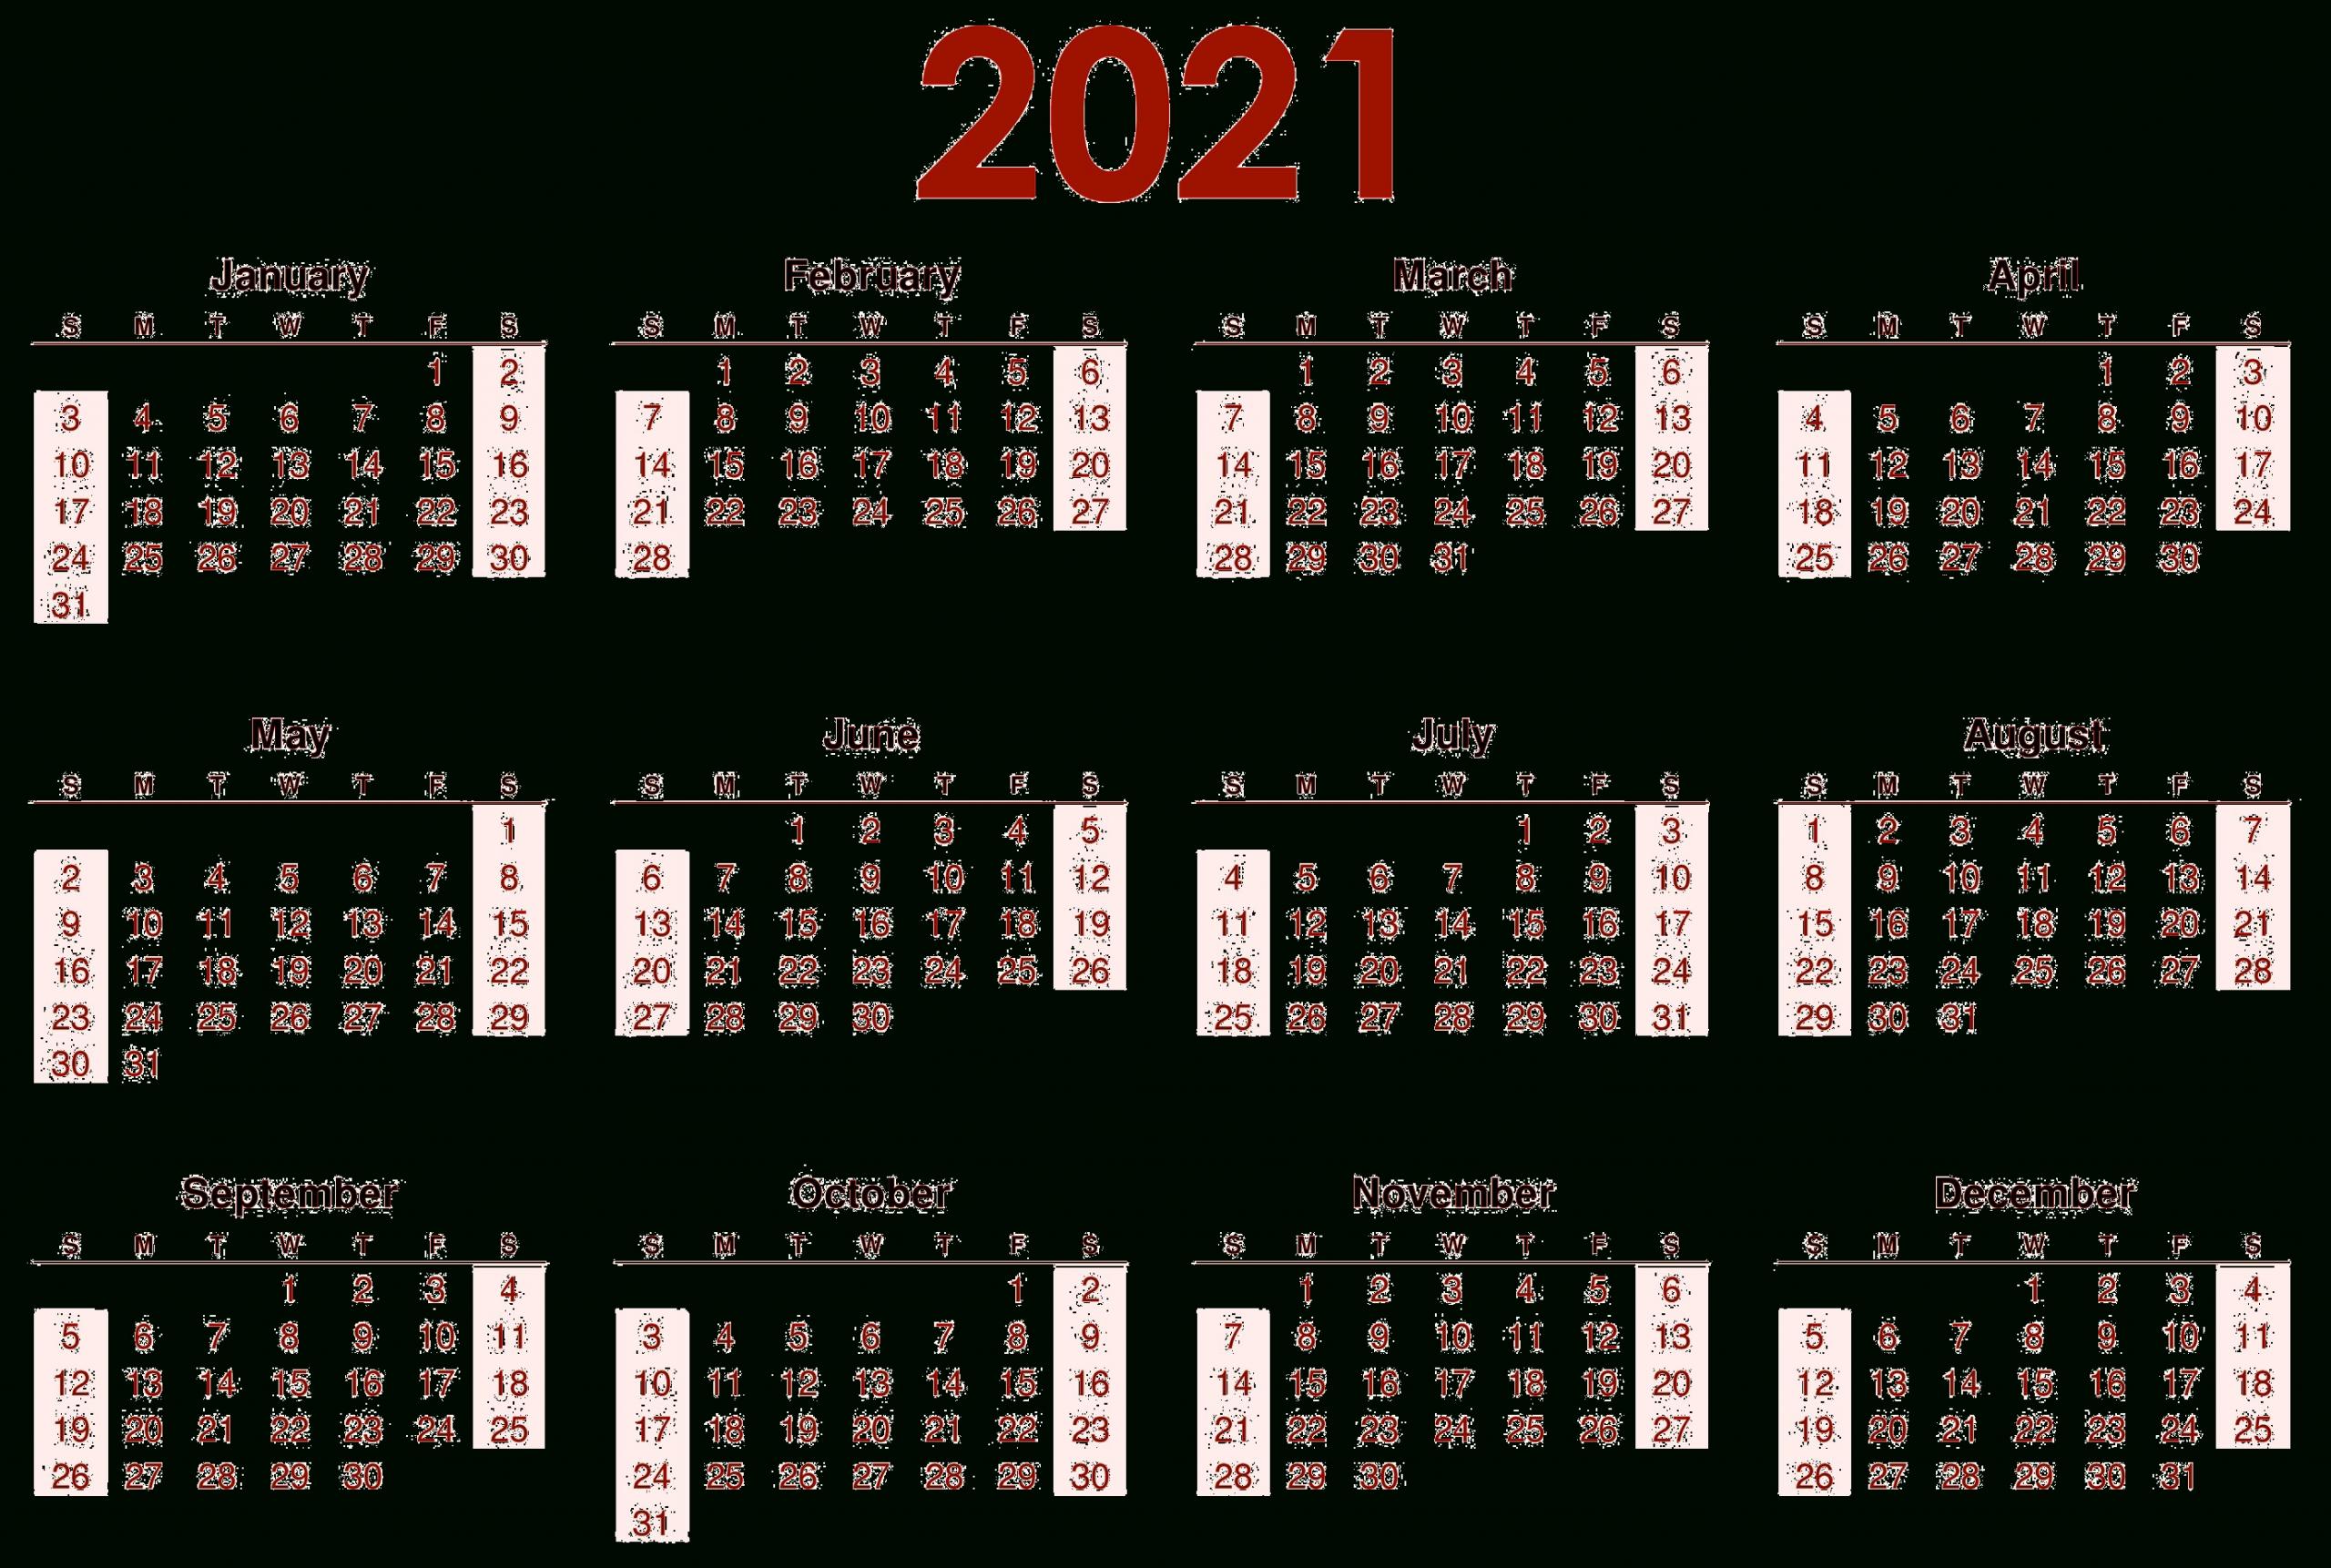 2021 Calendar Wallpapers - Top Free 2021 Calendar